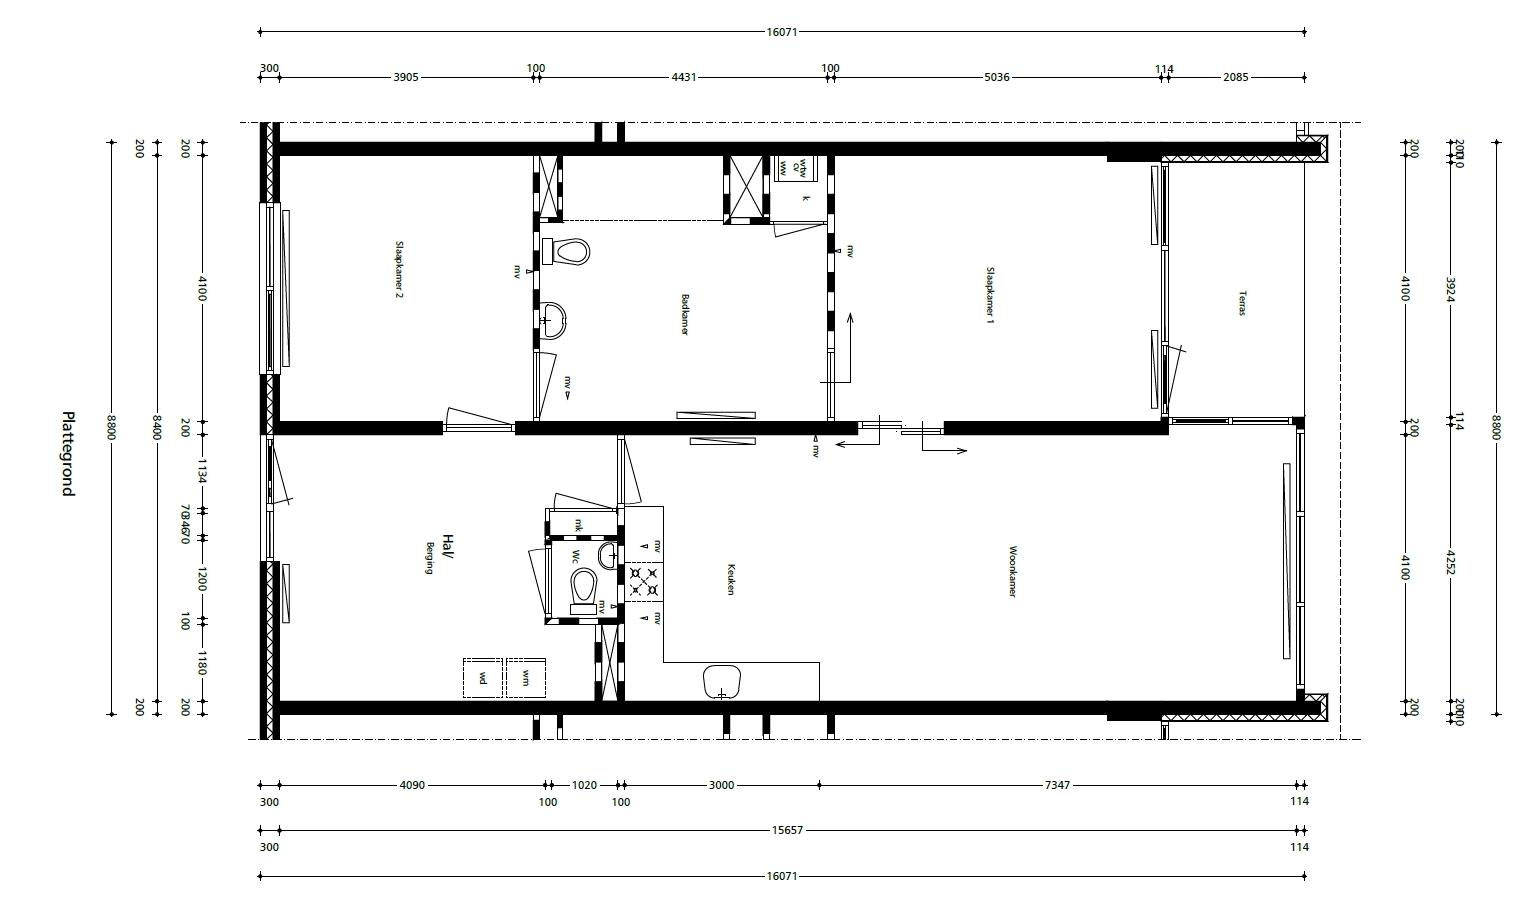 Beethovenstraat, plattegrond (D, 13-05-14)